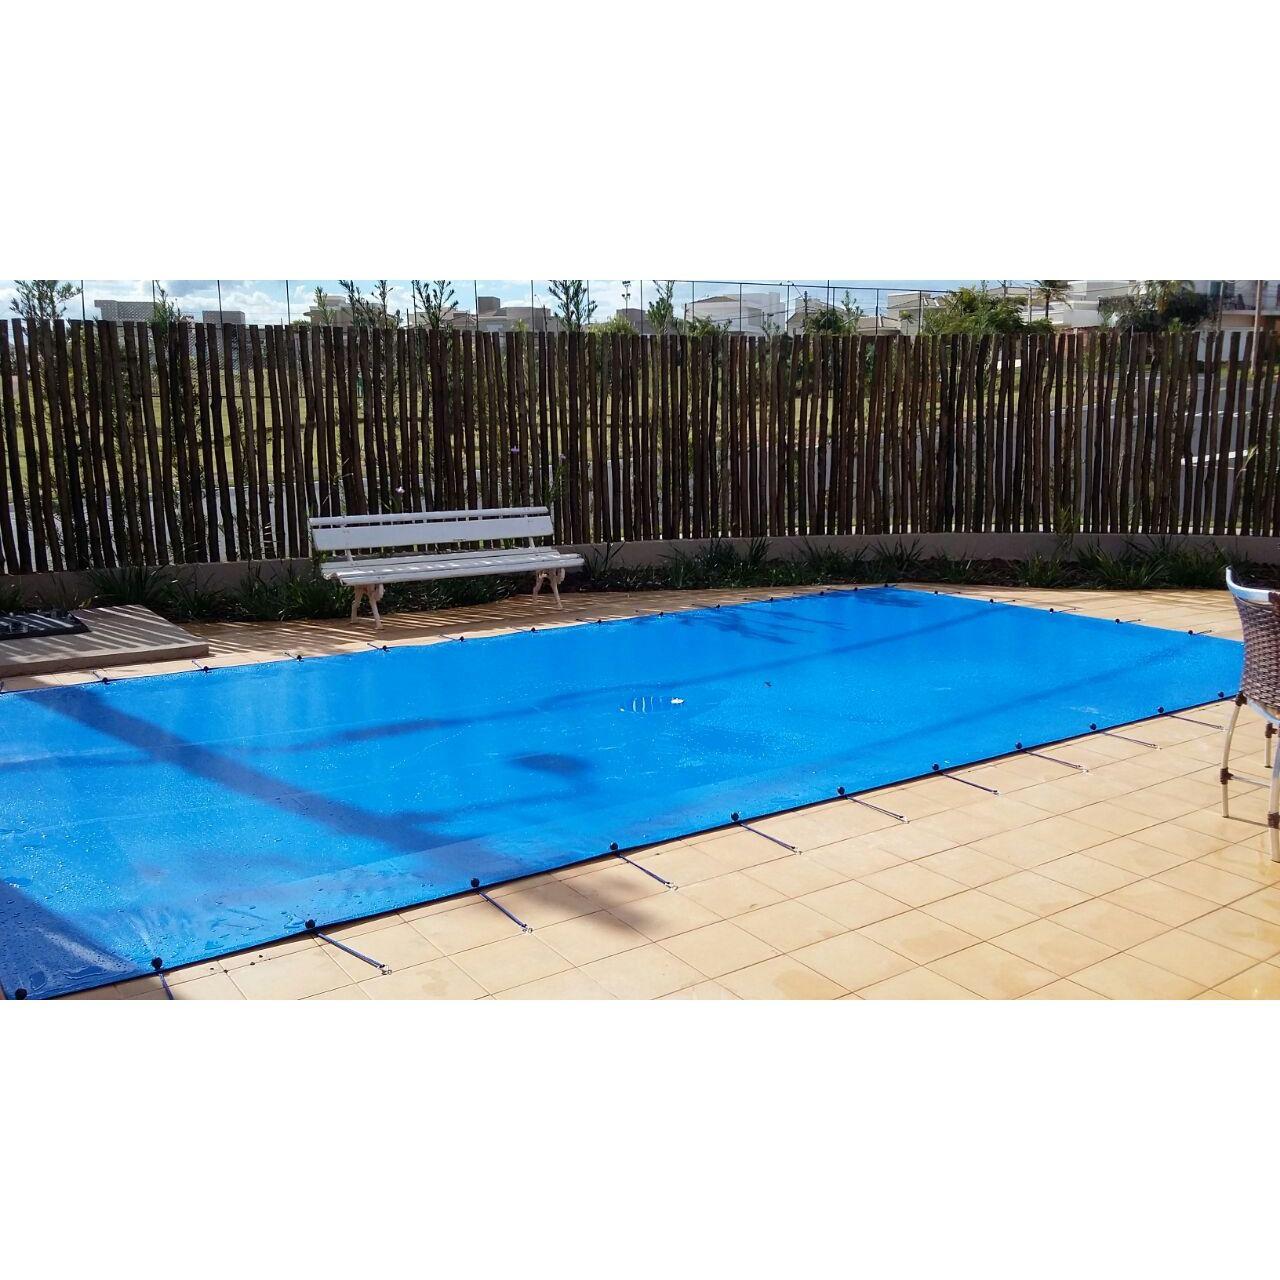 Lona Polietileno Azul 300 Micras - 7,5x3,5